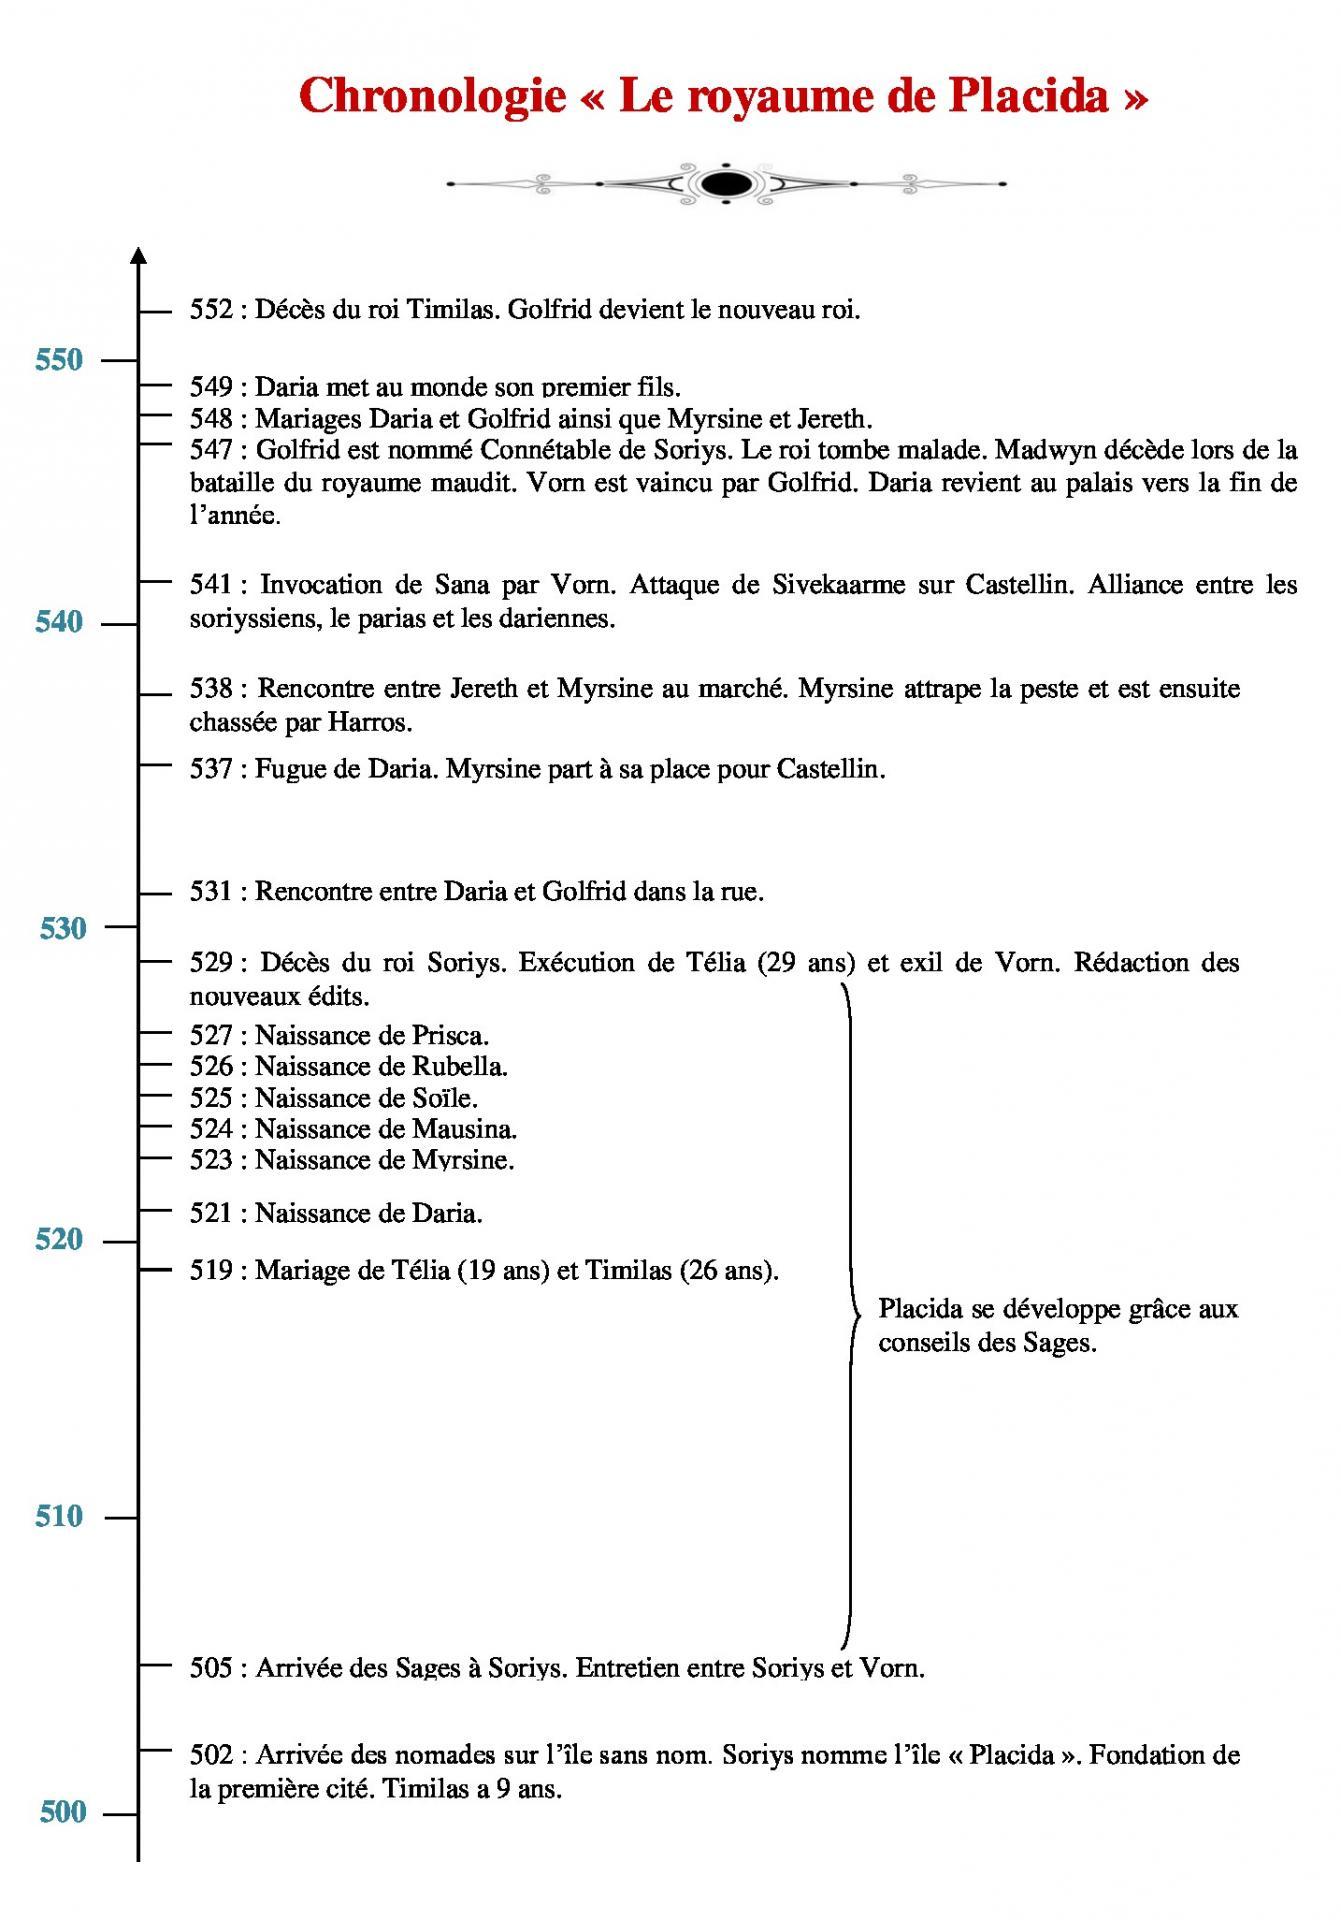 Chronologie placida 1